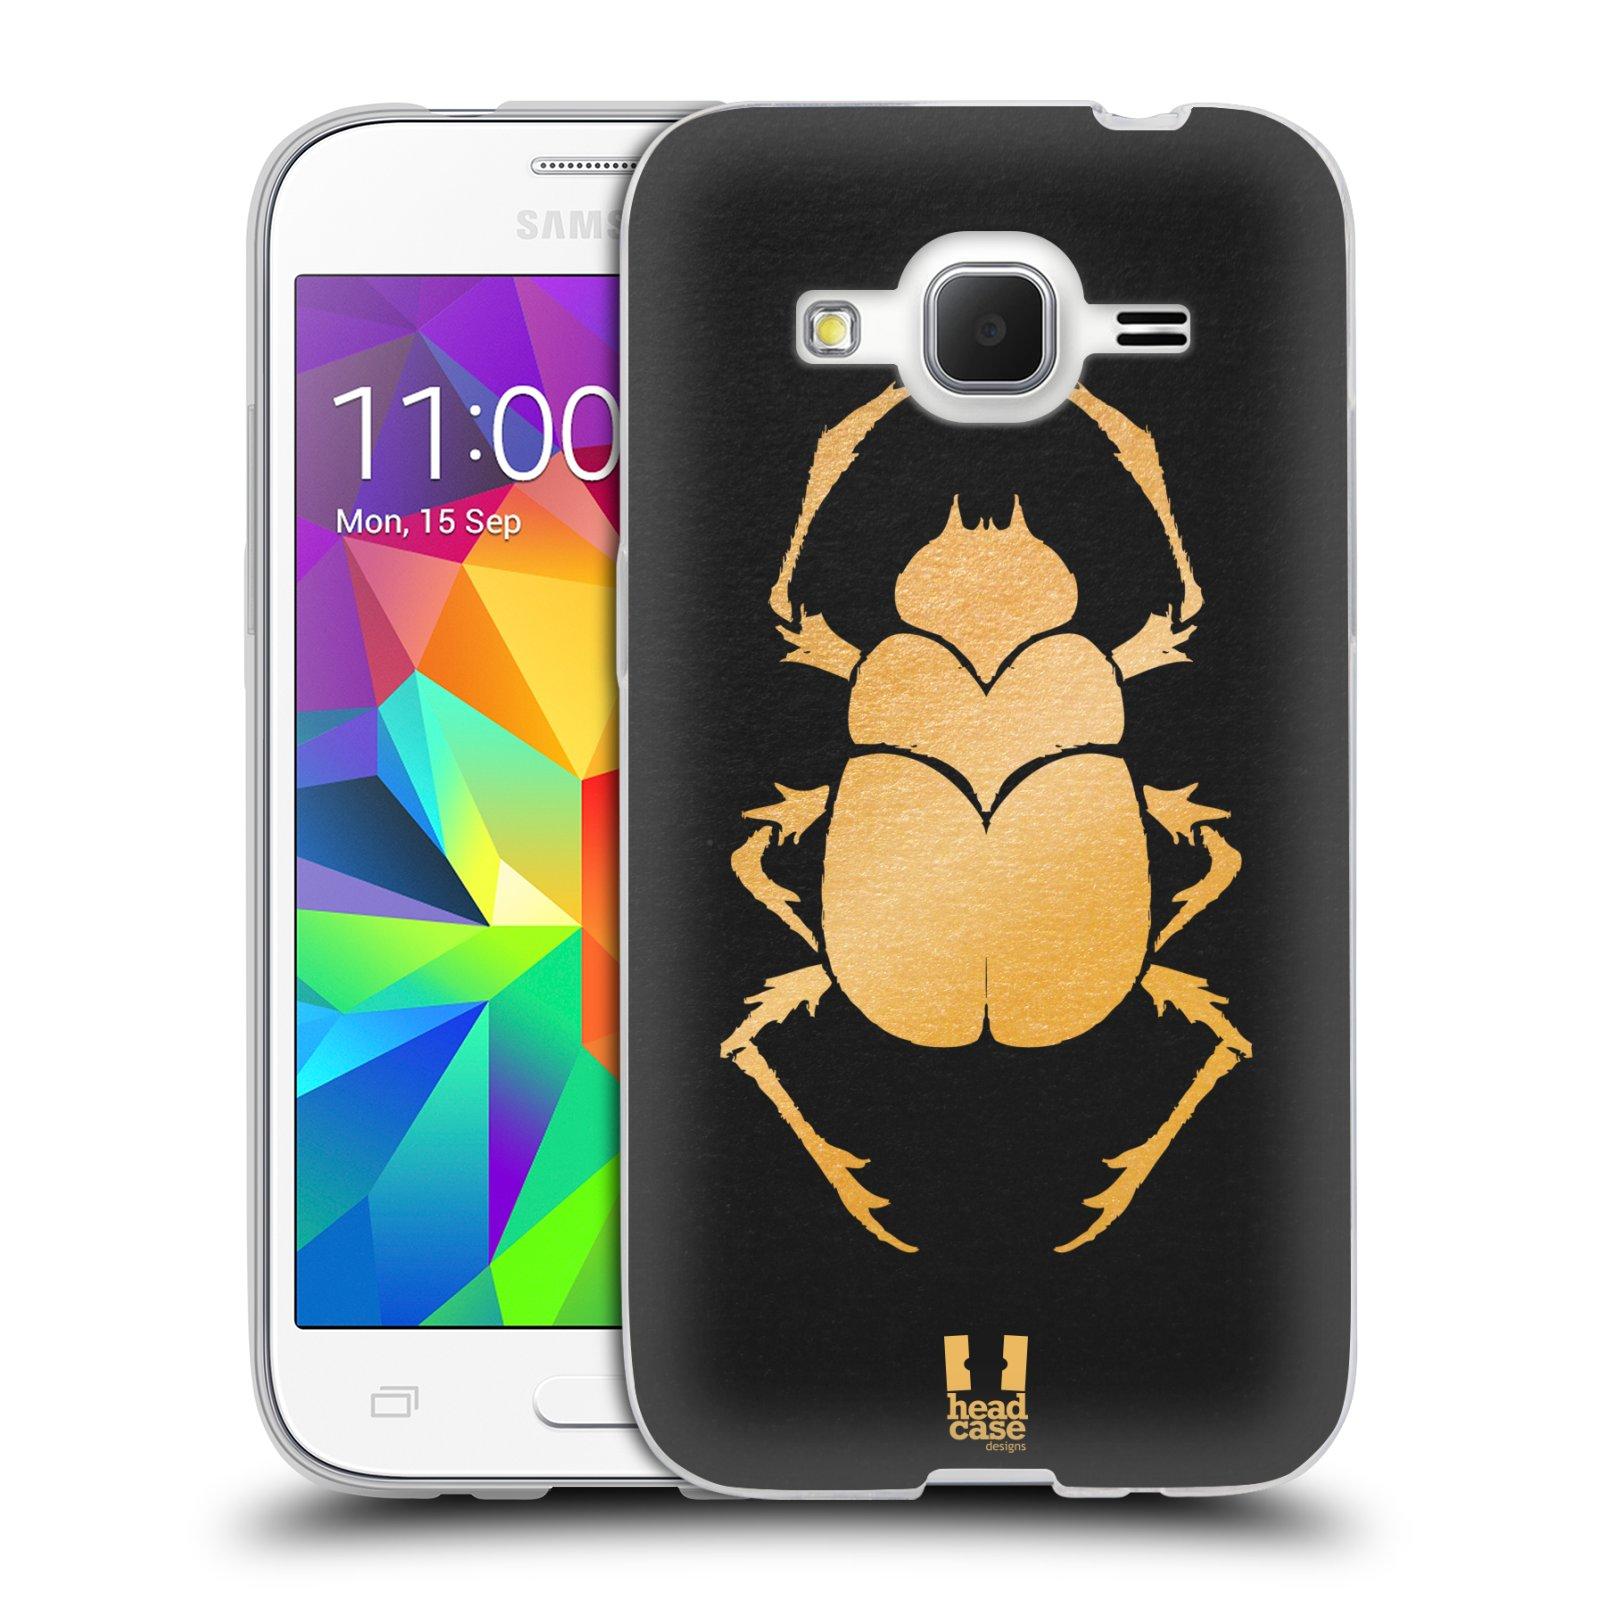 Silikonové pouzdro na mobil Samsung Galaxy Core Prime LTE HEAD CASE EGYPT SCARABEUS (Silikonový kryt či obal na mobilní telefon Samsung Galaxy Core Prime LTE SM-G360)